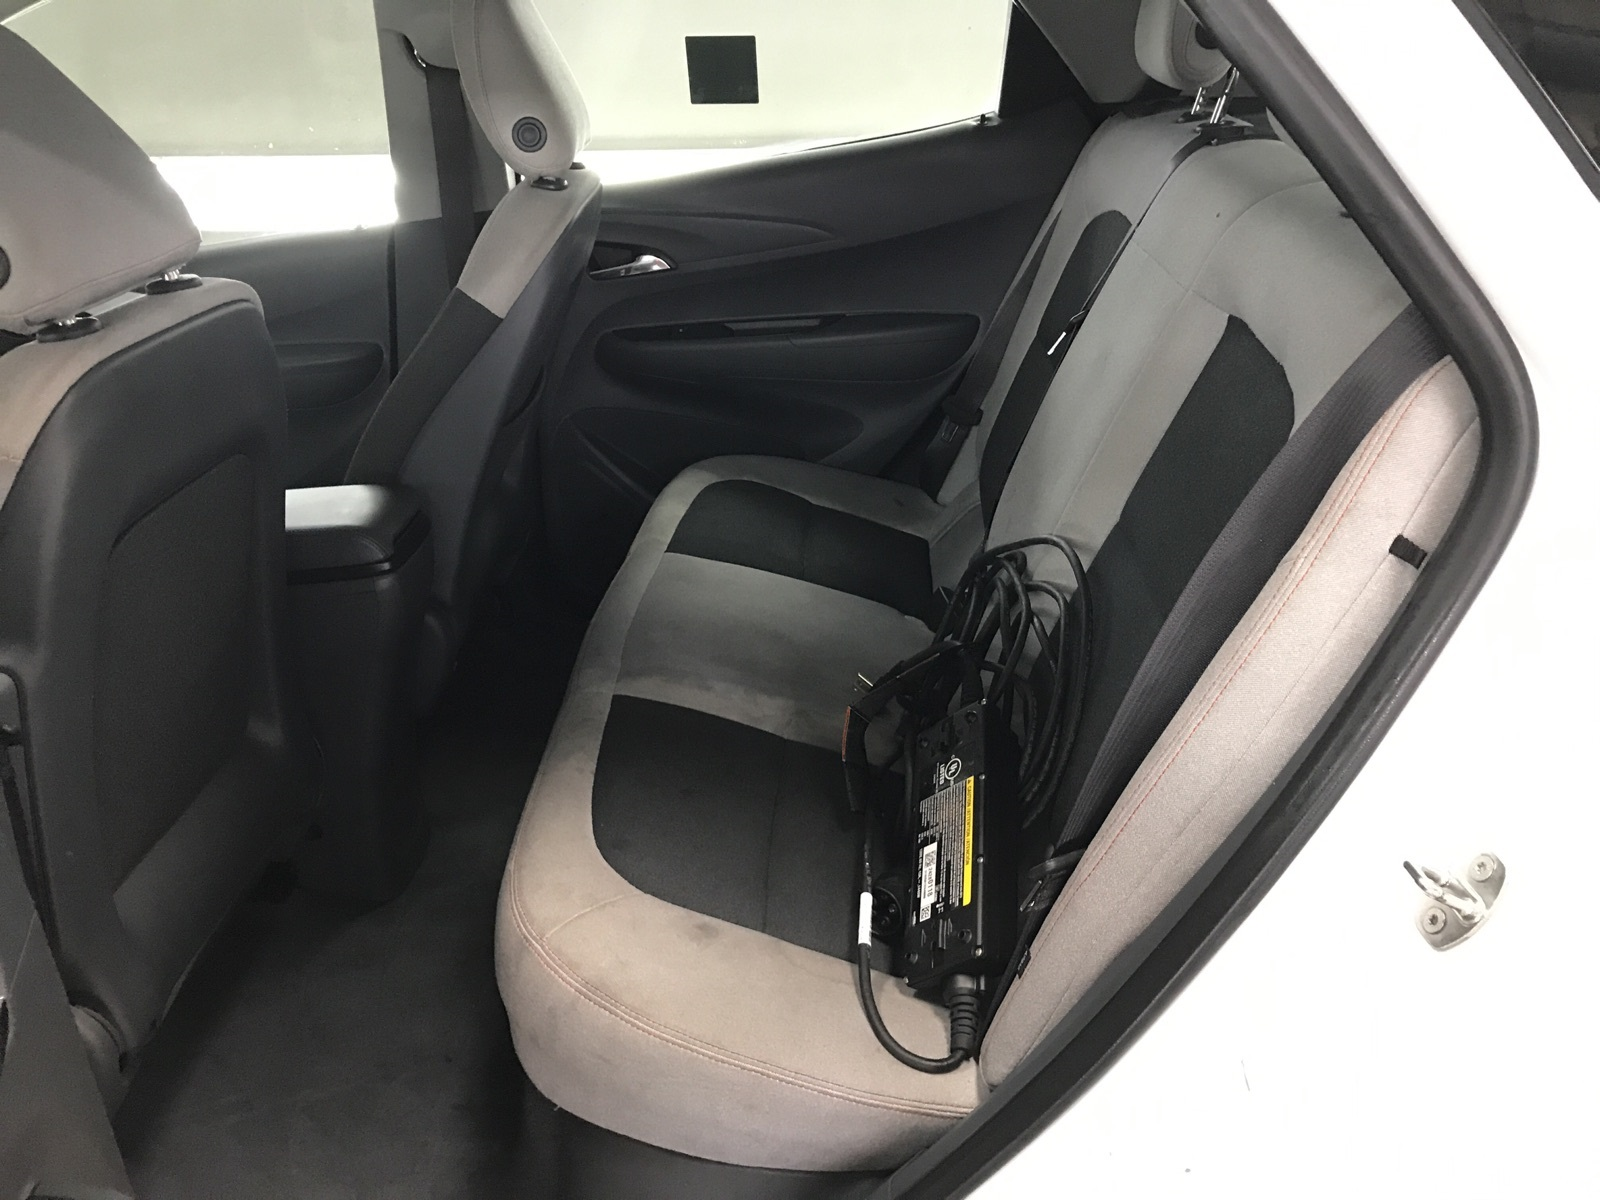 http://autocredit.com.ua/electro-cars/uploads/12/21-02-20/D102RS_XnS8FyOmTr.jpeg